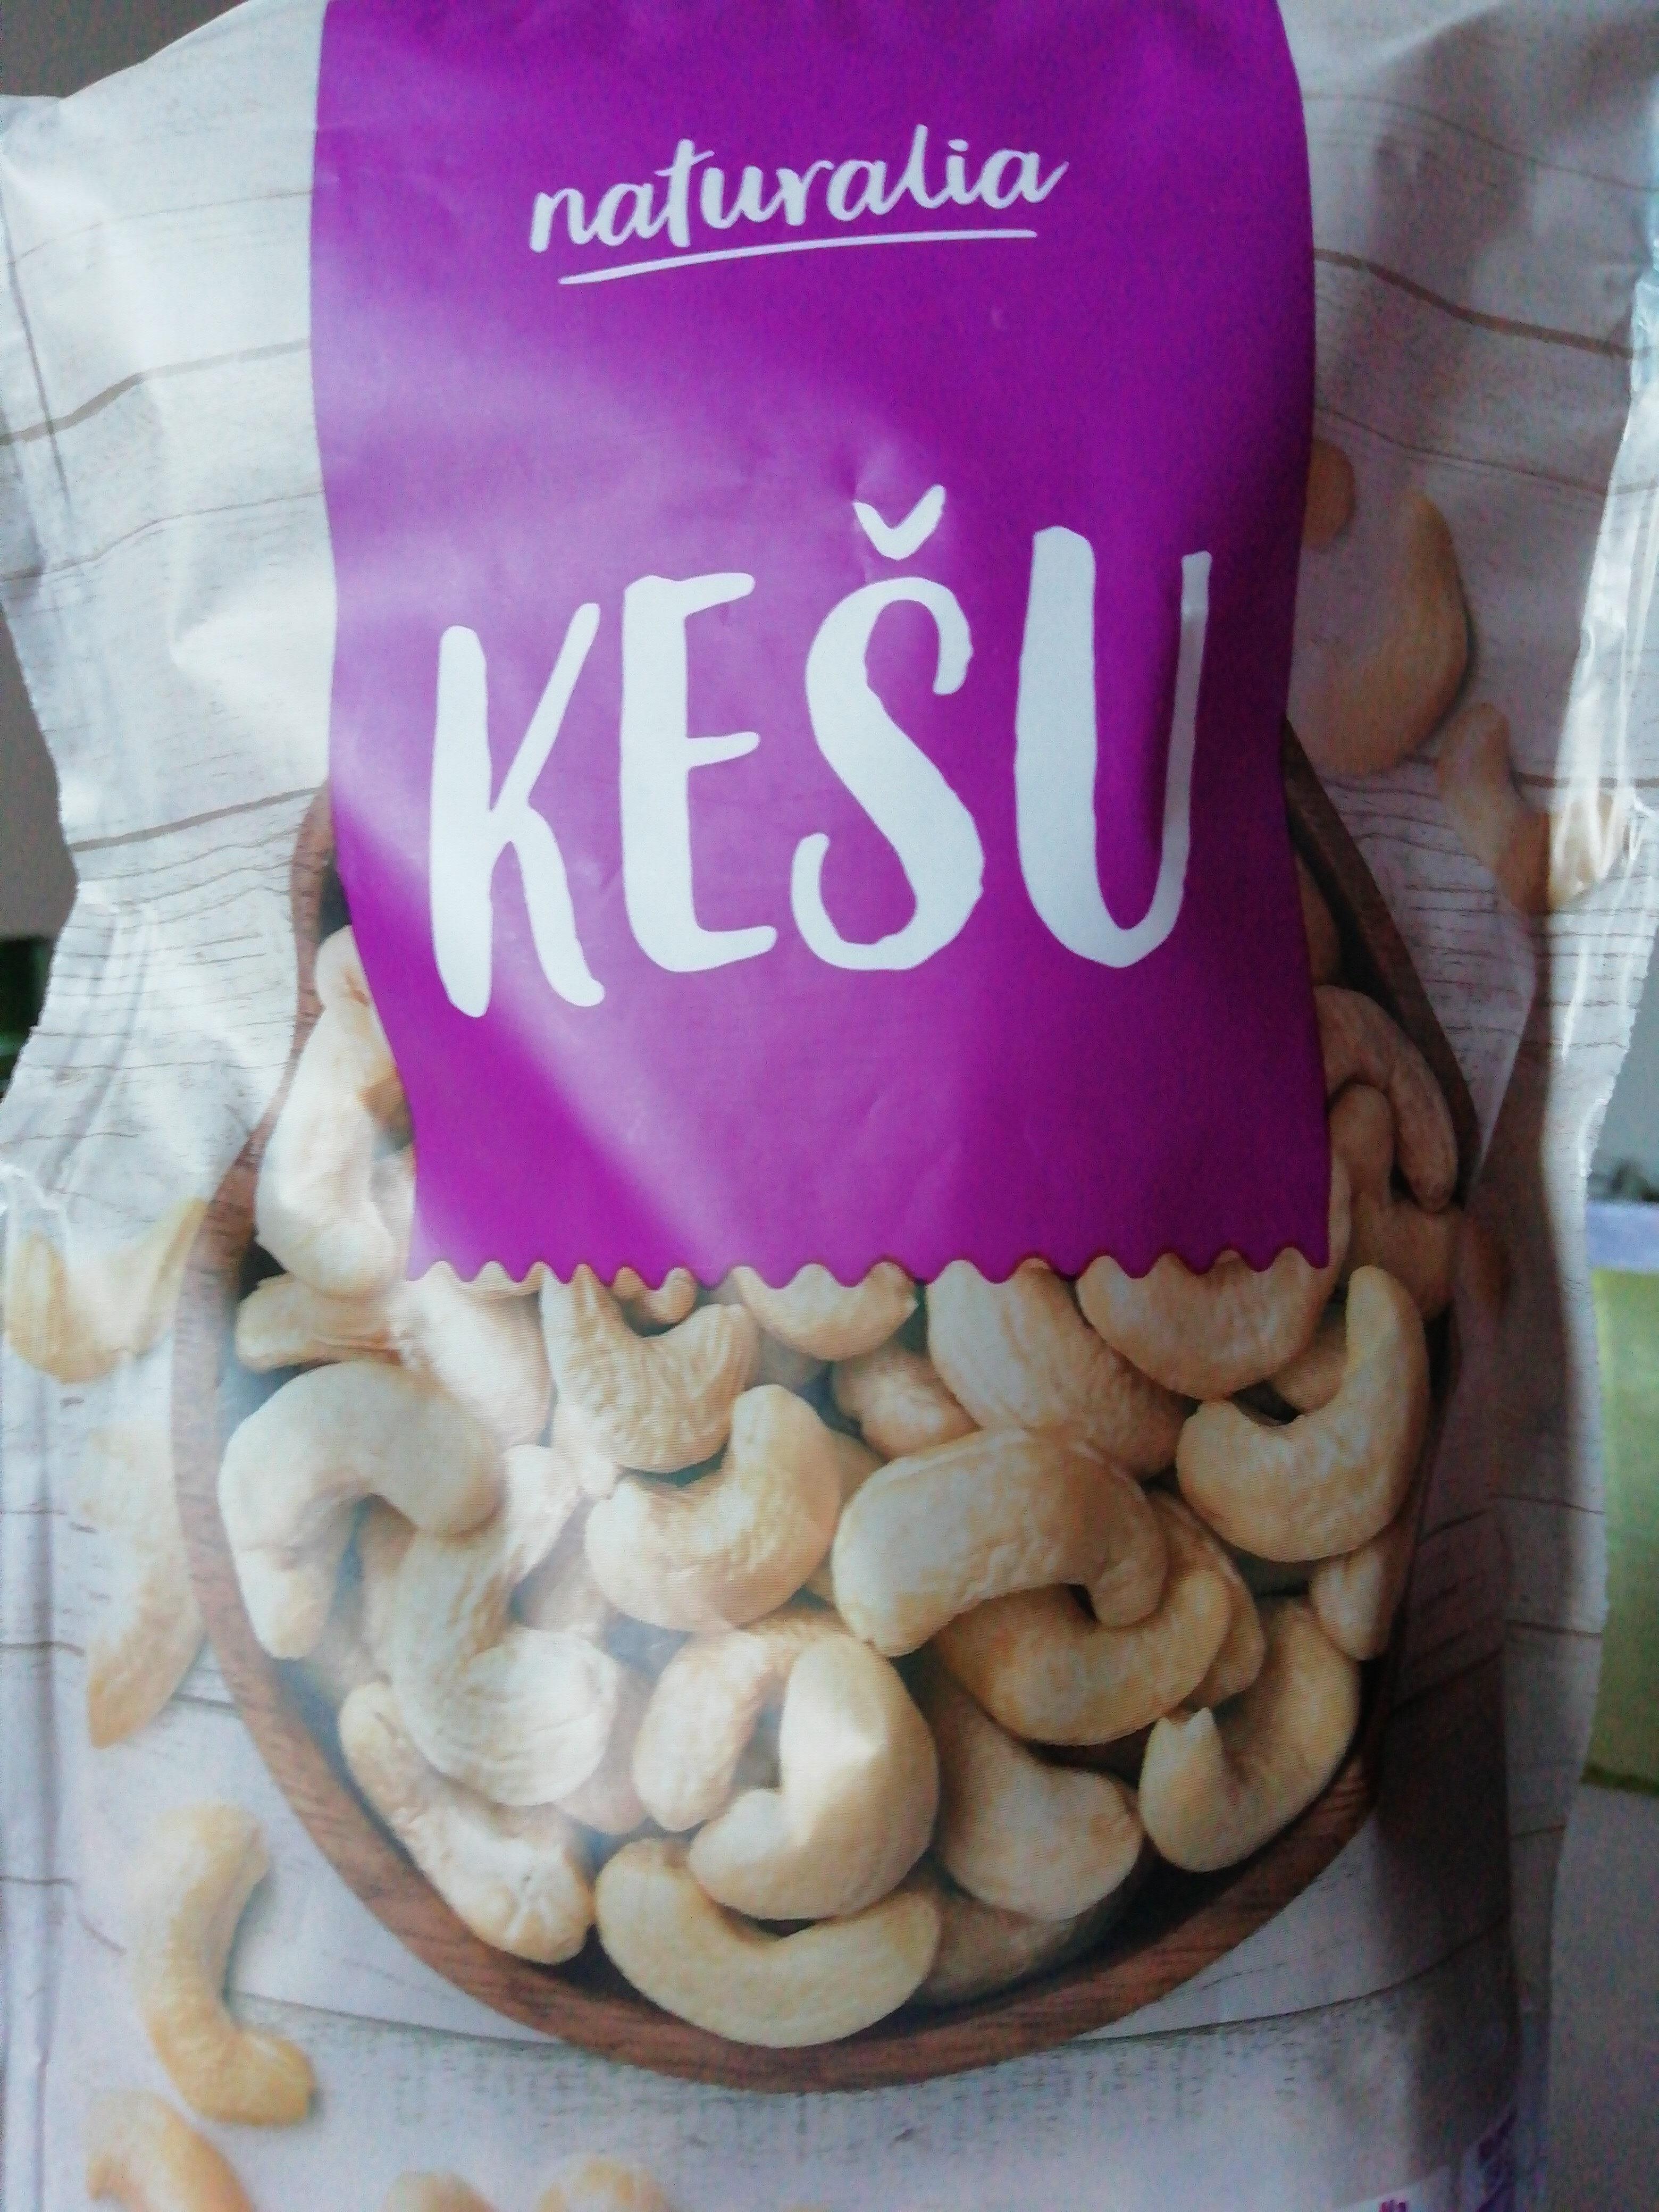 kešu - Produit - cs